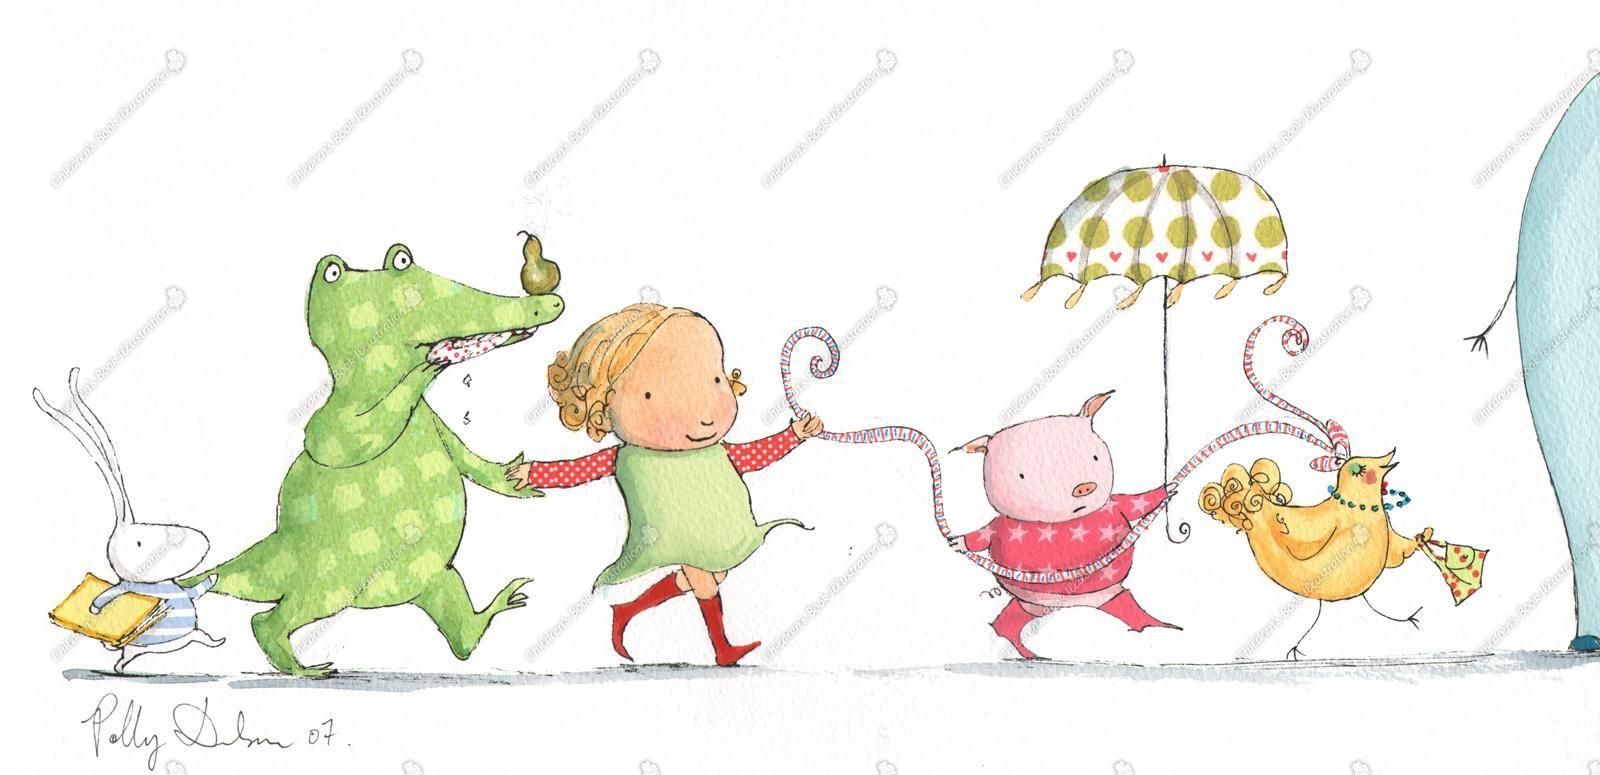 children's book illustrations | Please note that Children ...